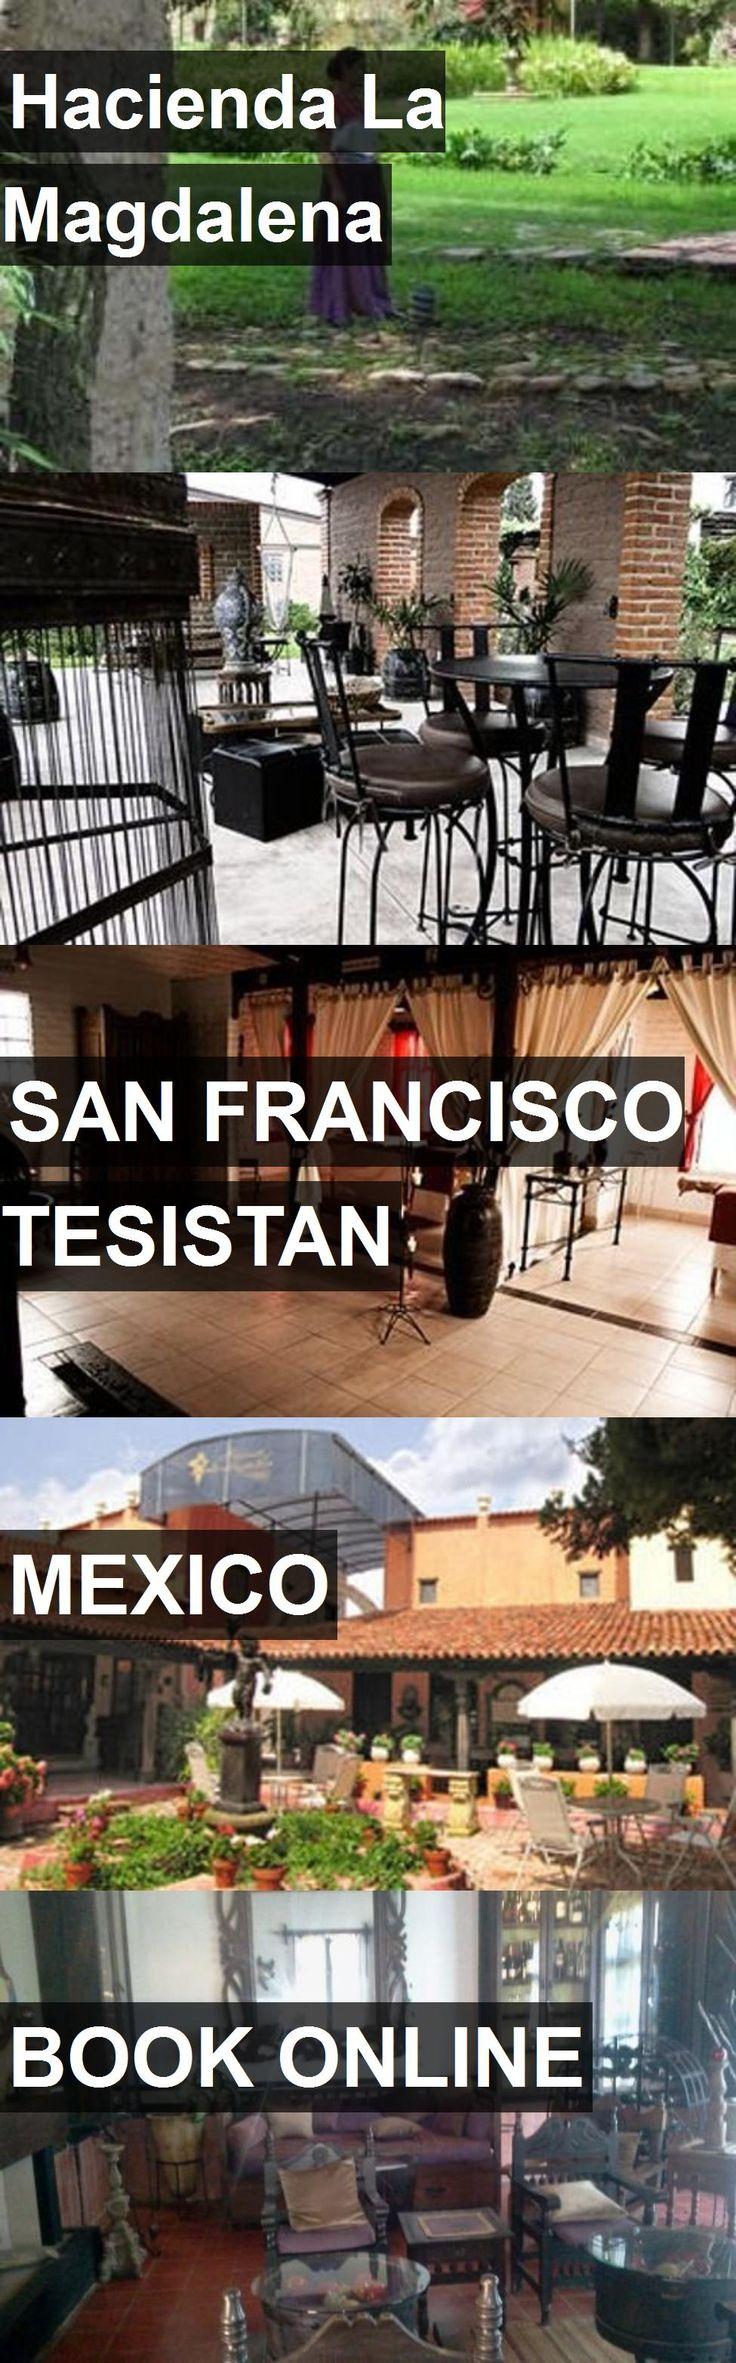 Hotel Hacienda La Magdalena in San Francisco Tesistan, Mexico. For more information, photos, reviews and best prices please follow the link. #Mexico #SanFranciscoTesistan #travel #vacation #hotel